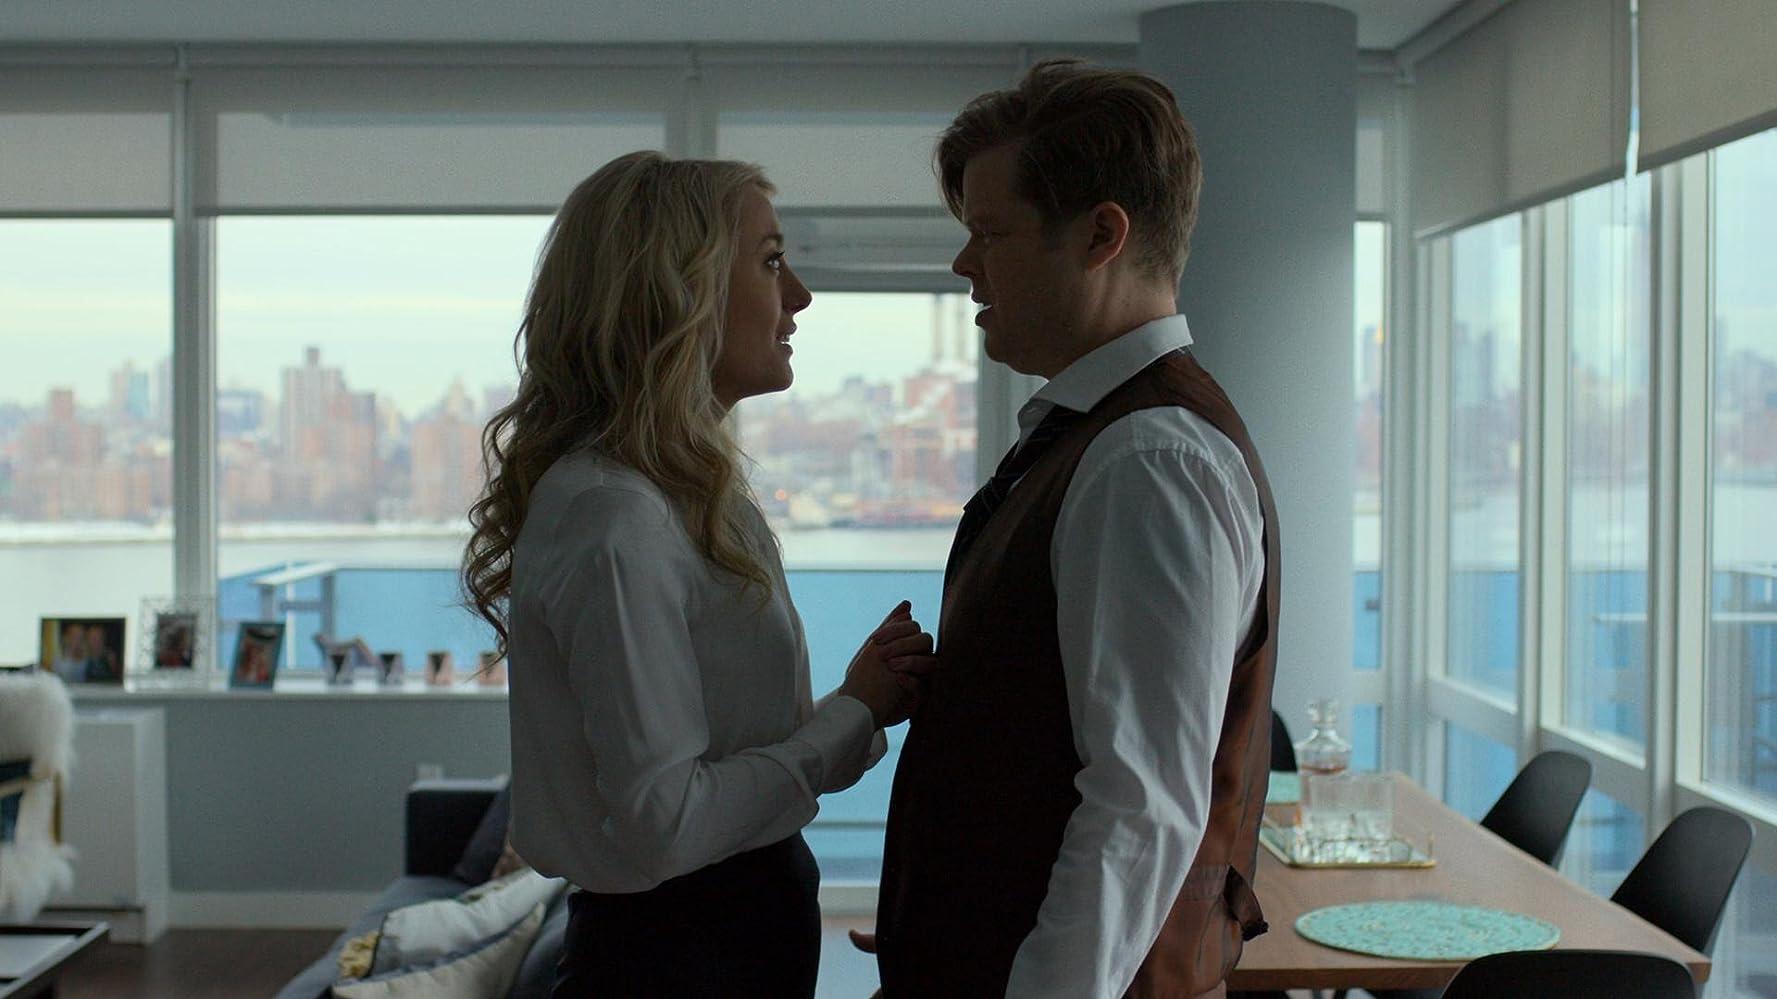 Elden Henson and Amy Rutberg in Daredevil (2015)